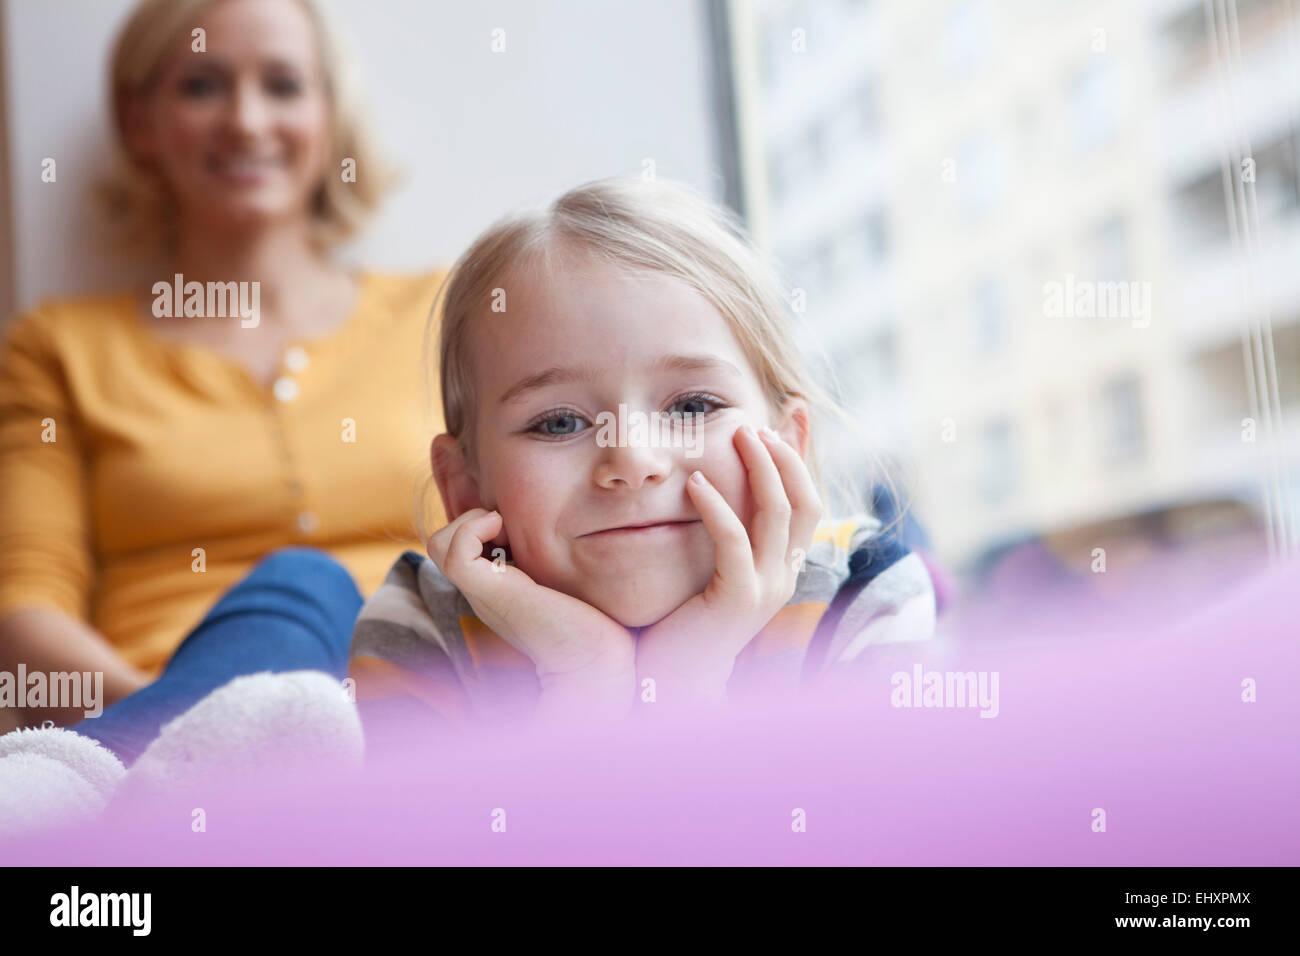 Smiling girl avec la mère en arrière-plan Photo Stock